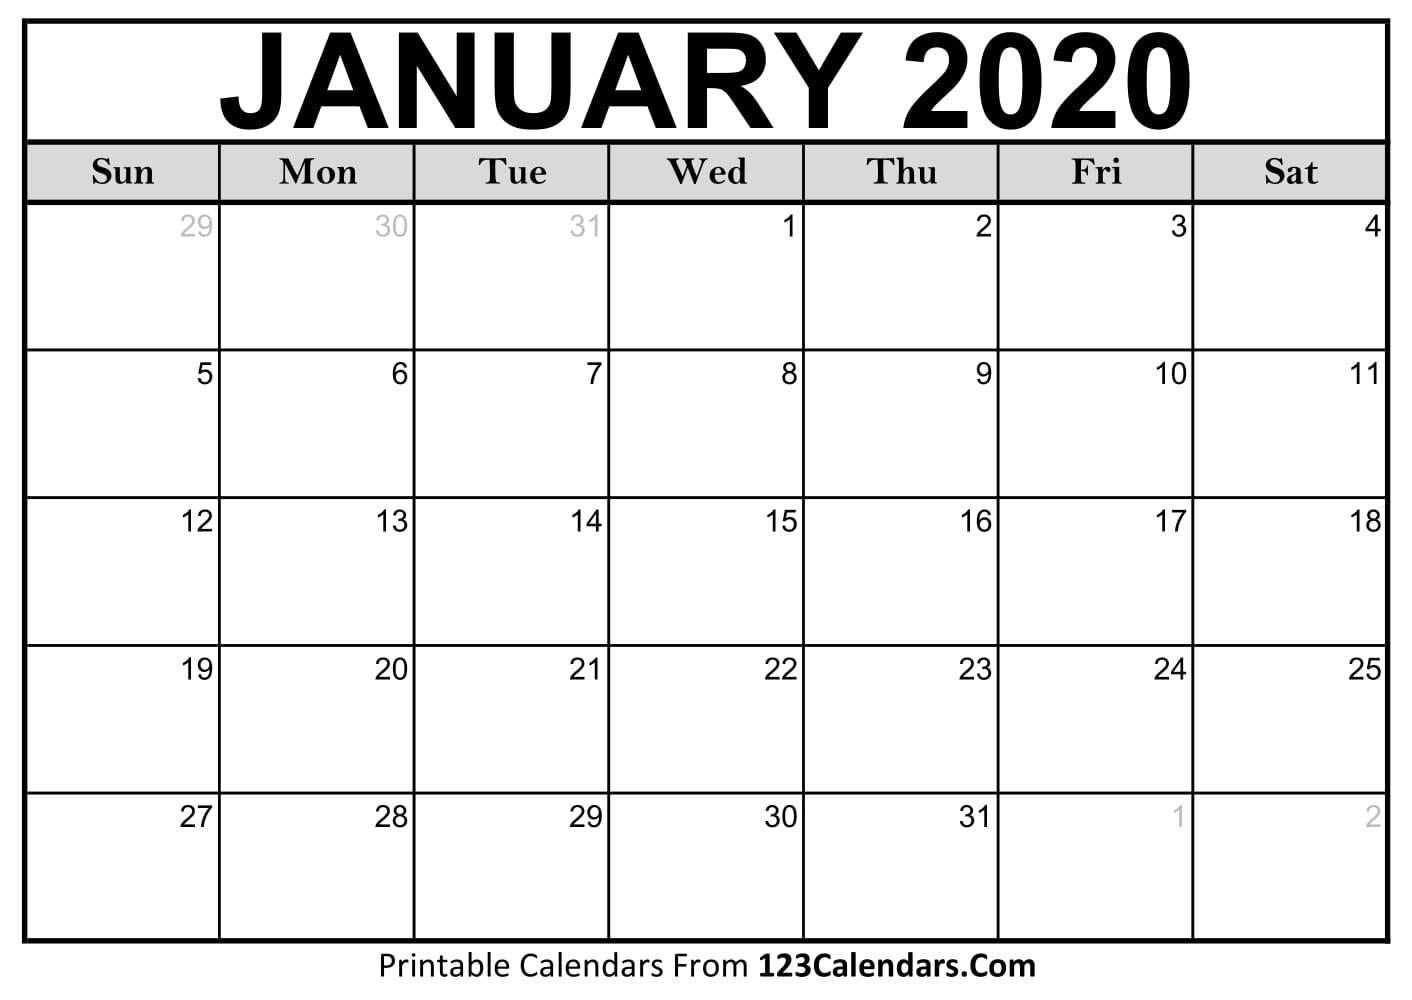 January 2020 Printable Calendar | 123Calendars regarding 2020 Fill In Calendar